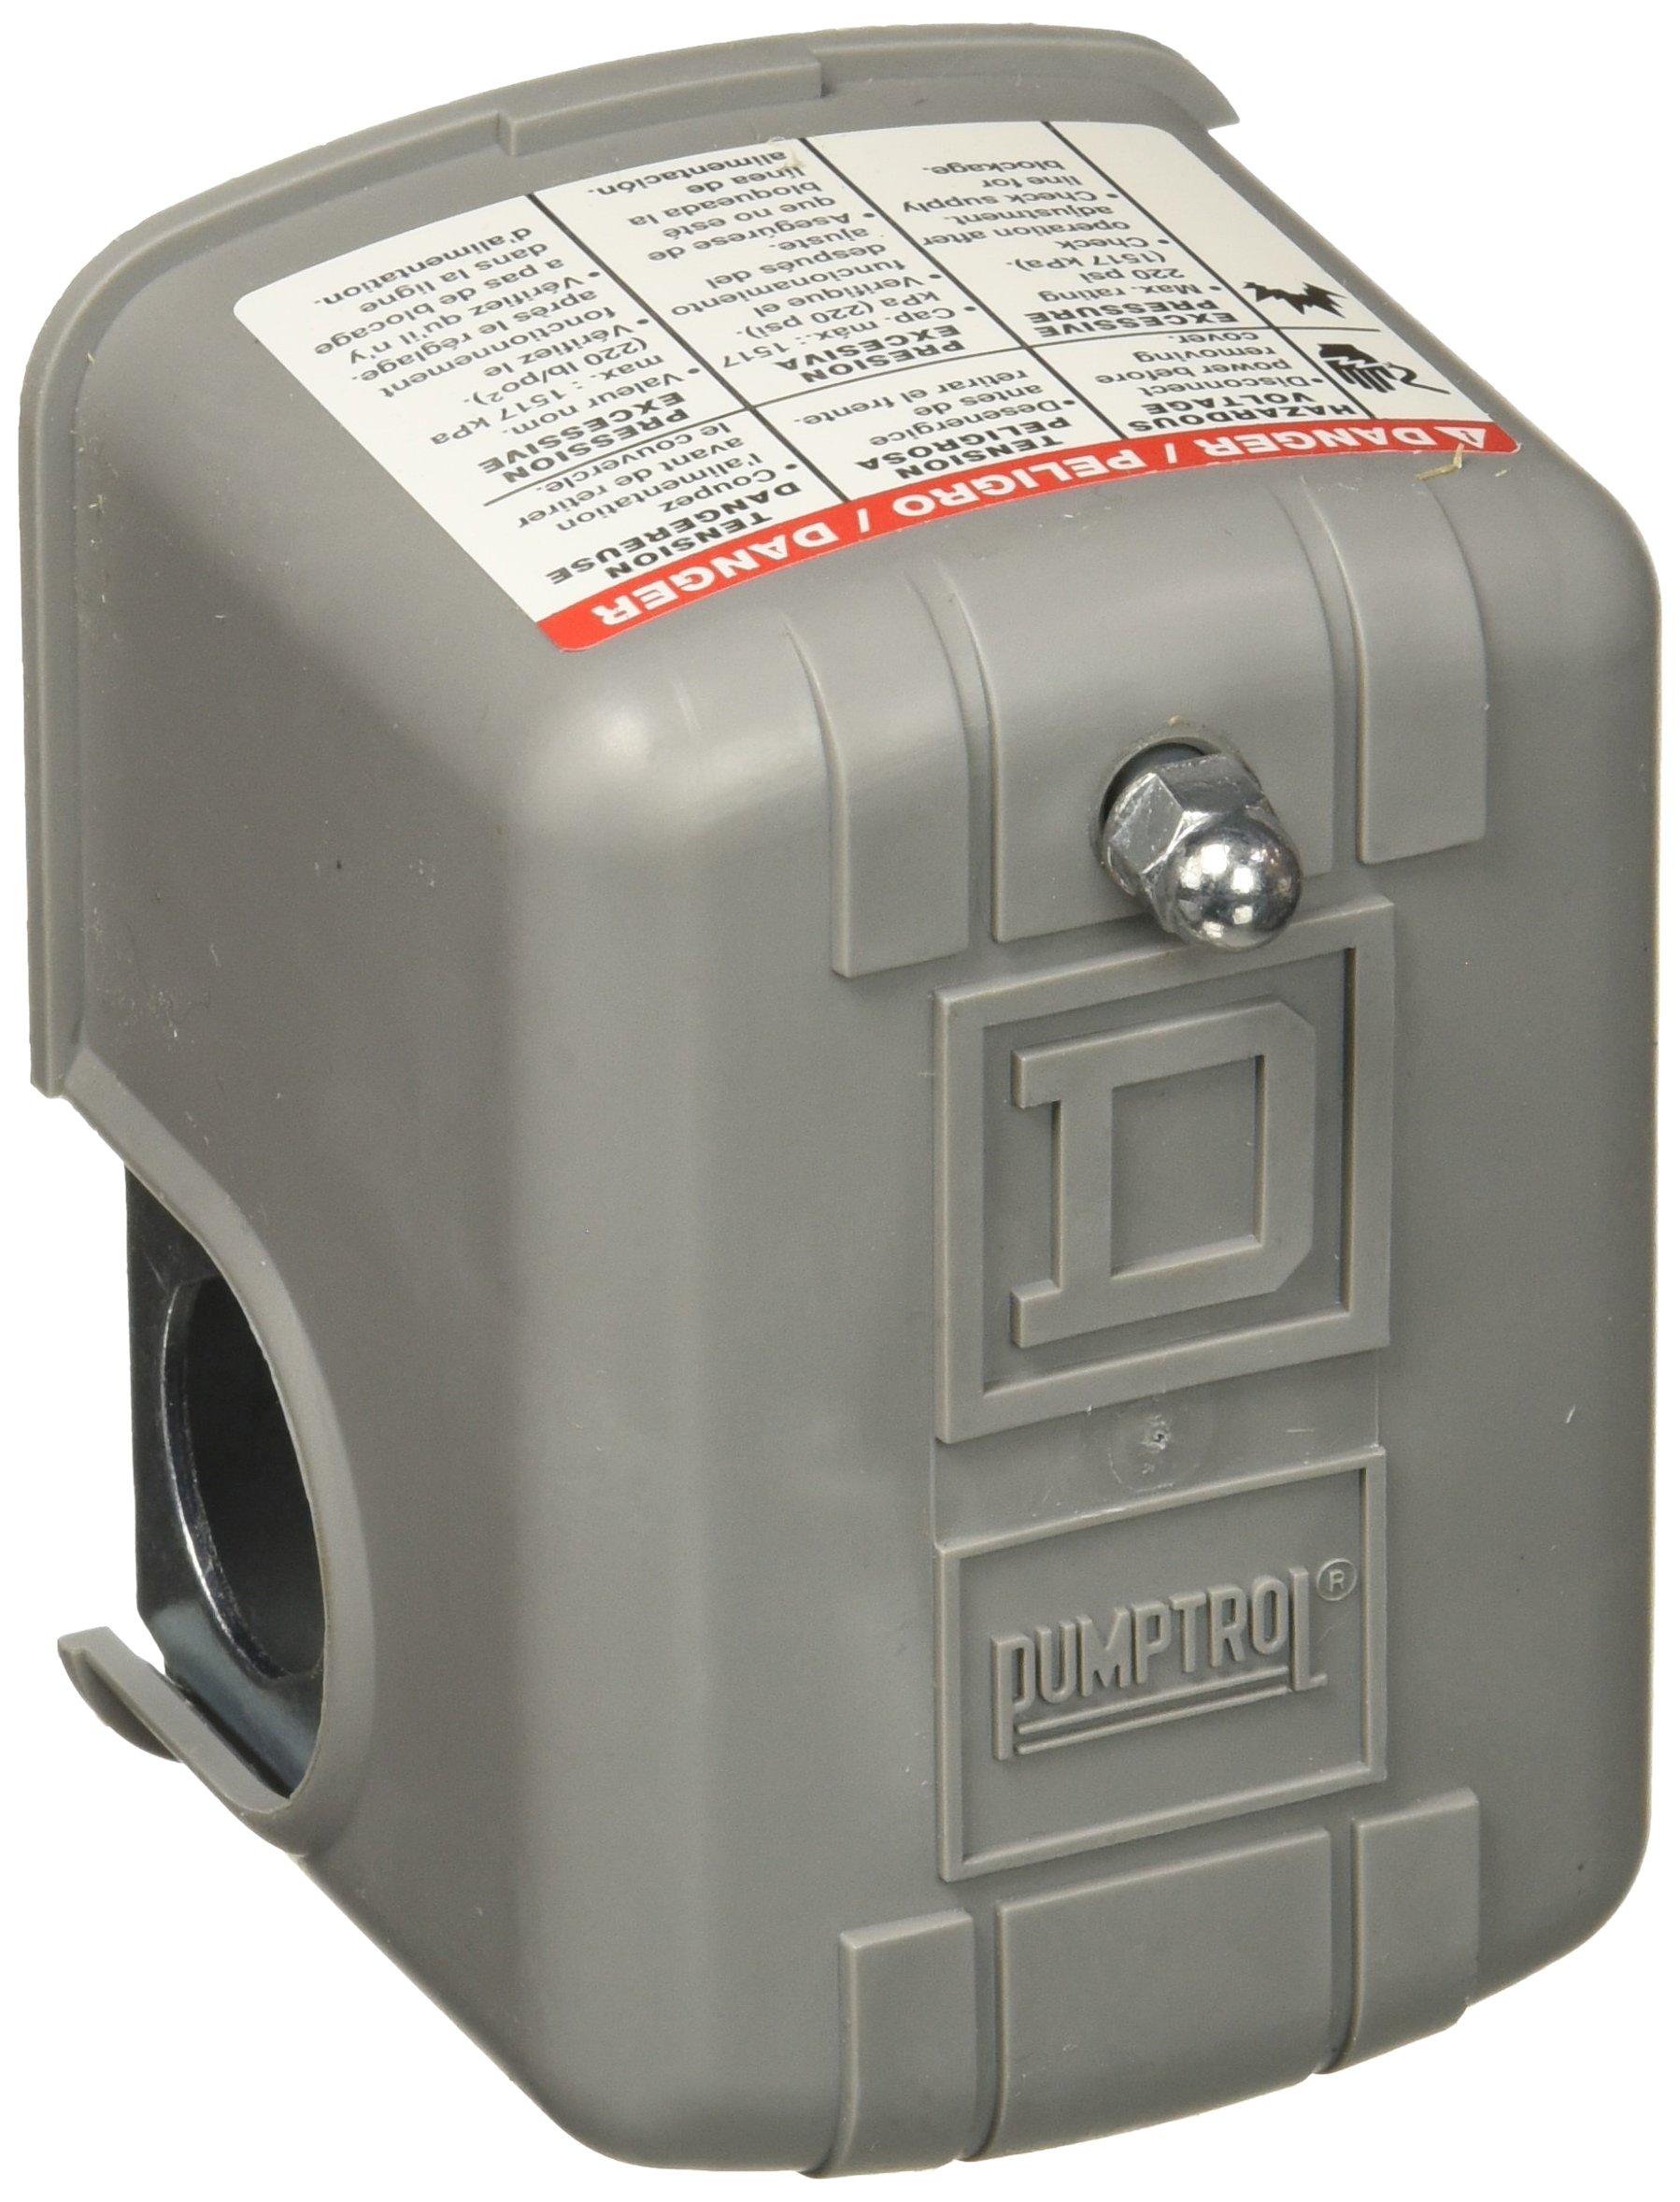 Square D 9013 FSG2 30/50 switch Schneider Electric 30-50 PSI Pumptrol Water Pressure Switch